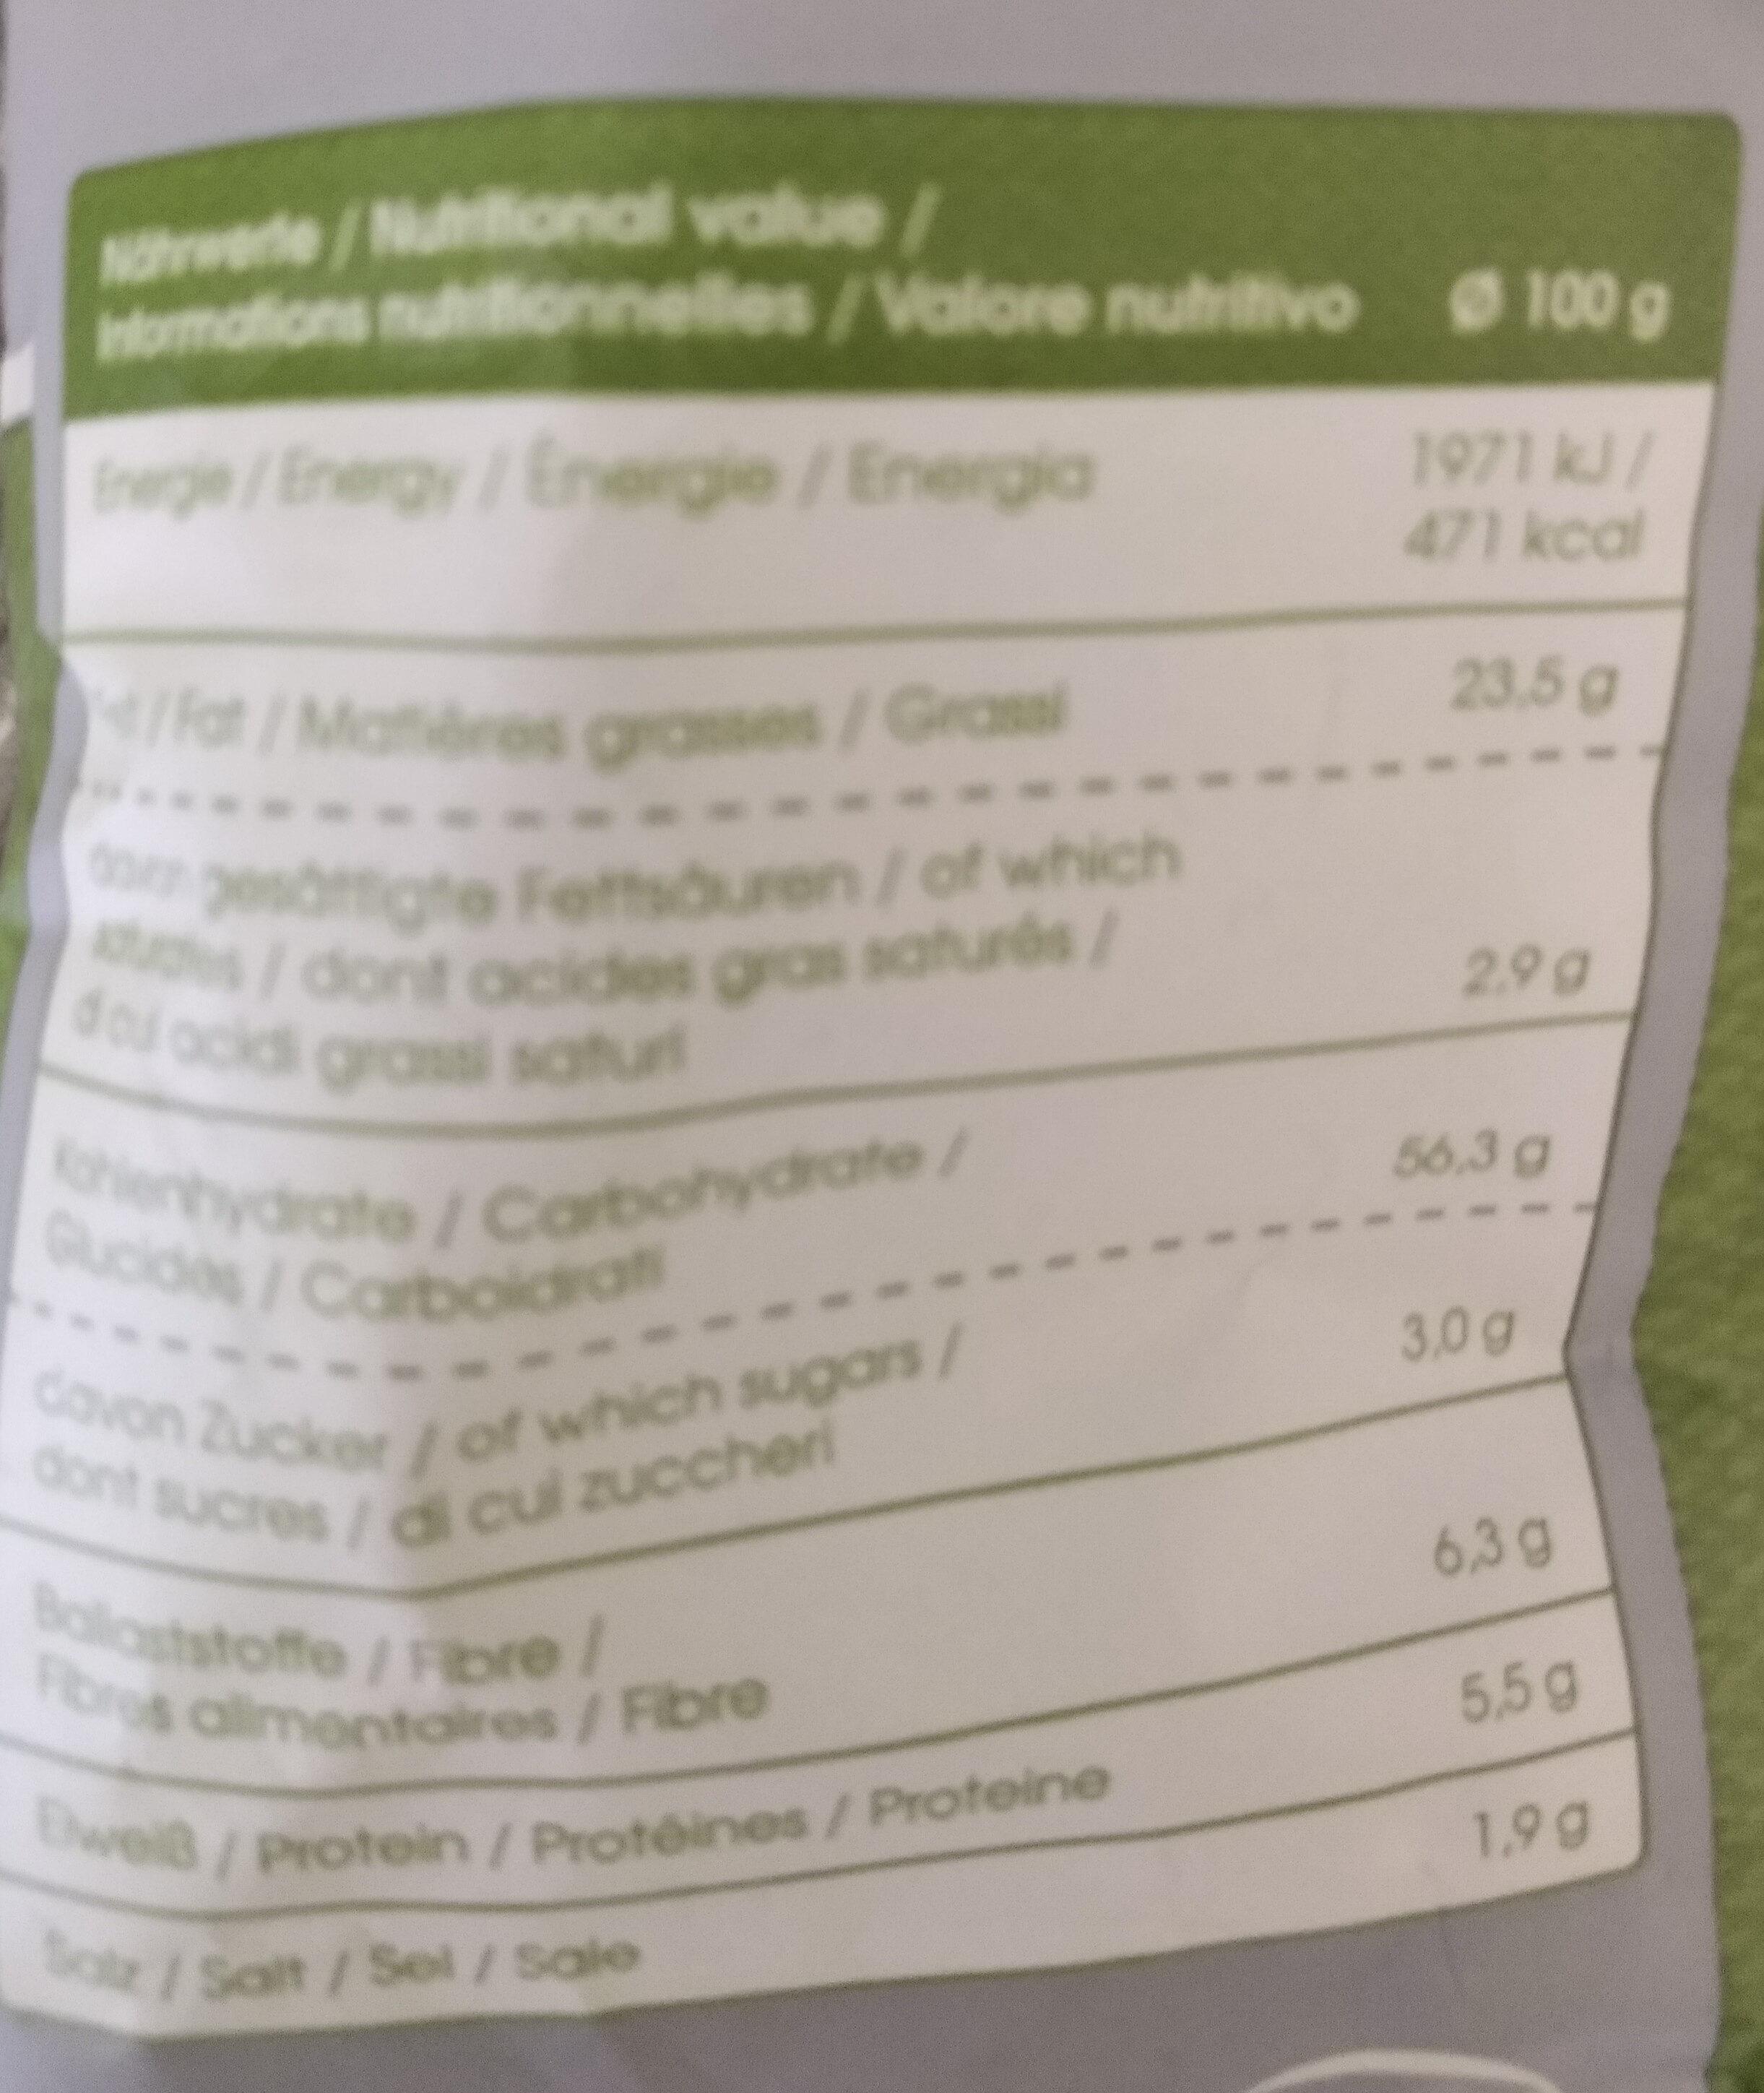 Bio-kesselchips paprika - Nutrition facts - fr